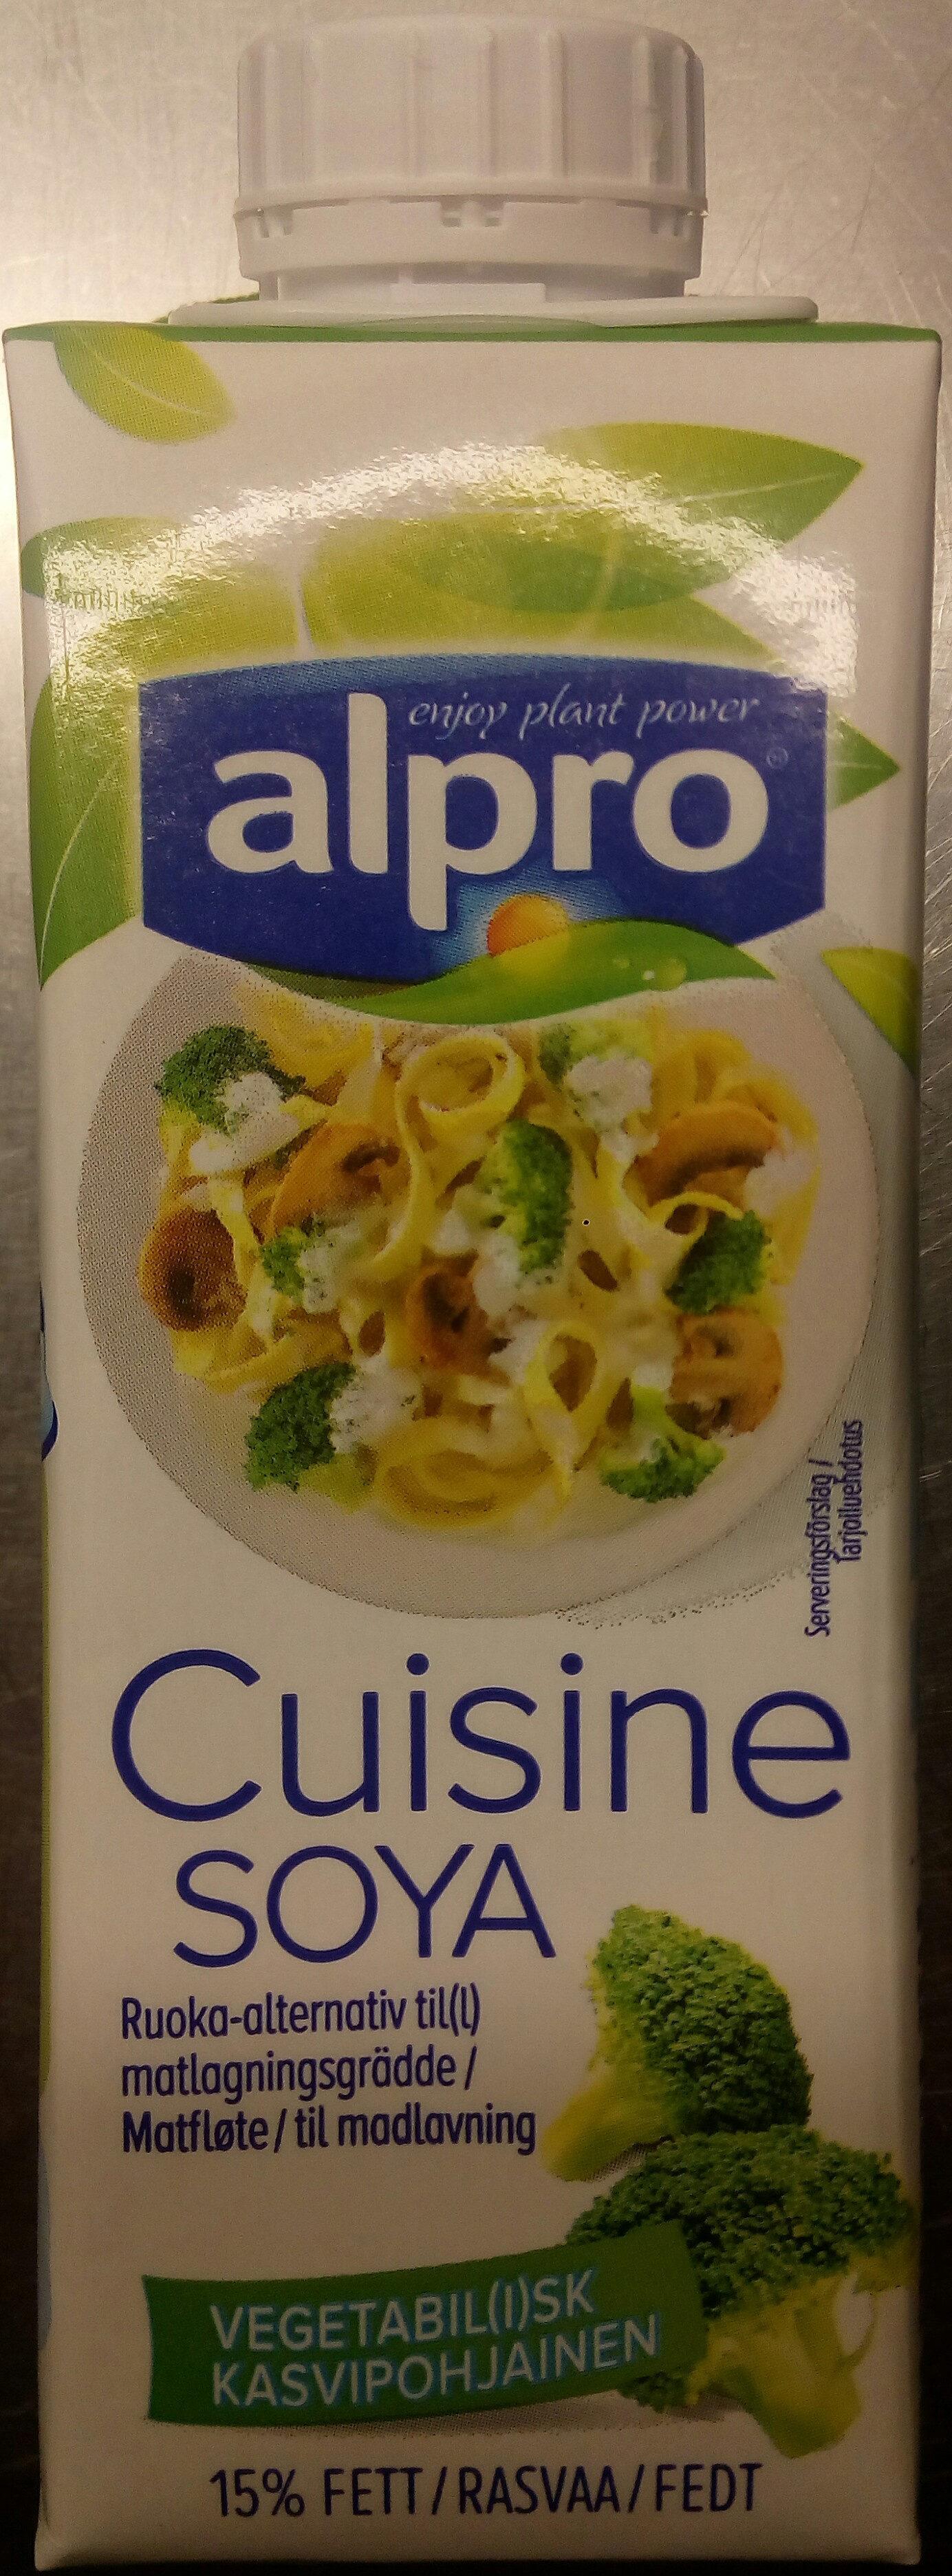 Alpro Cuisine Soya - Product - sv